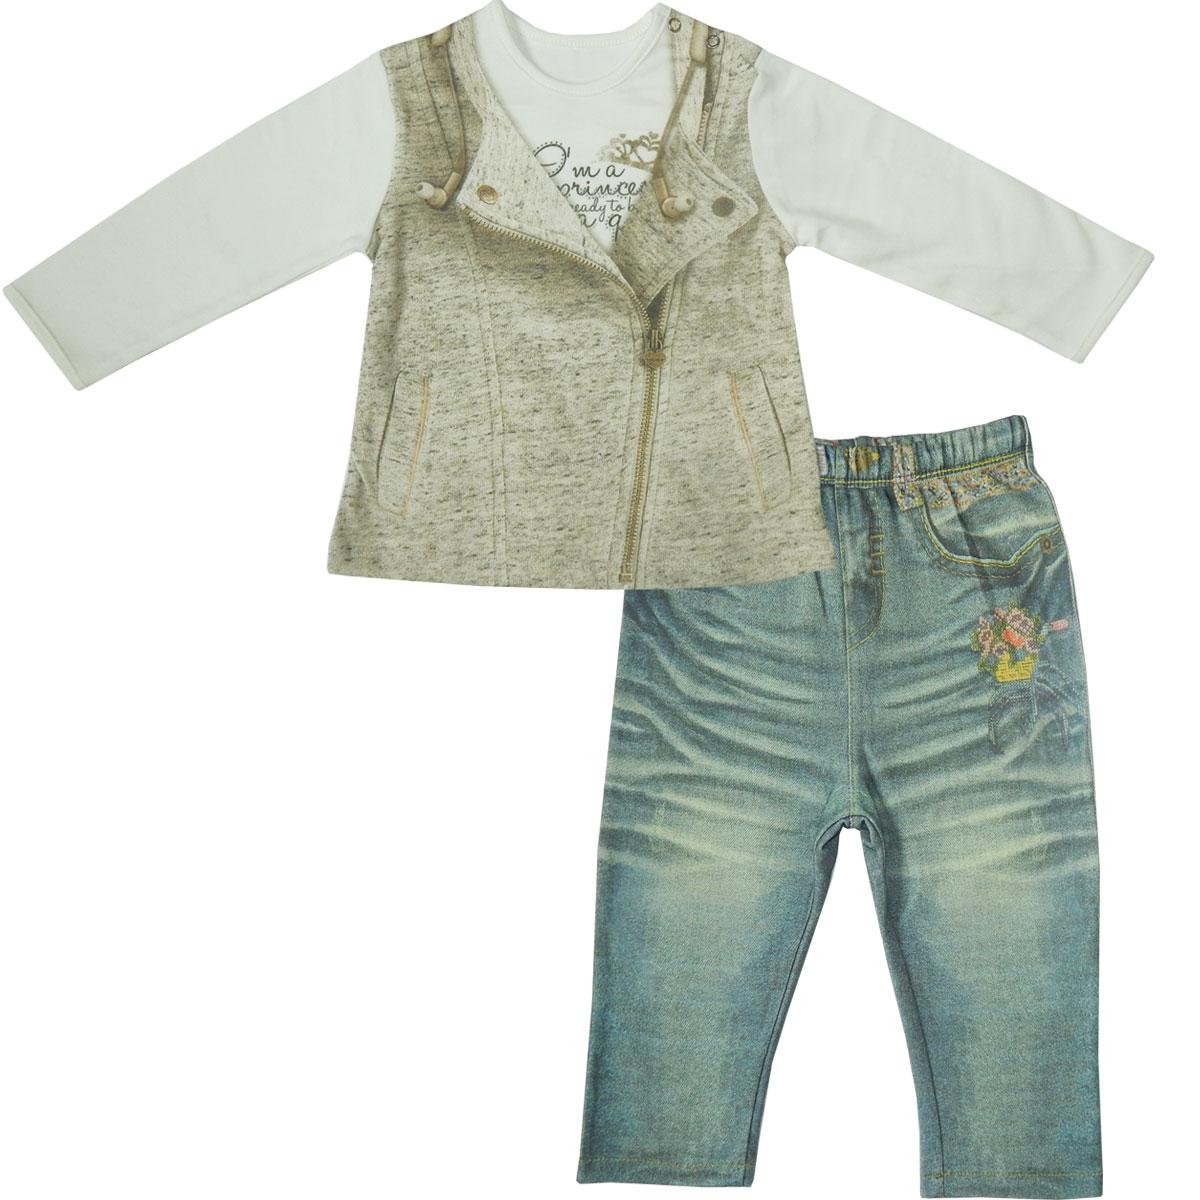 Комплект одежды Папитто для девочки Fashion Jeans 595-05 белый/синий р.22-74